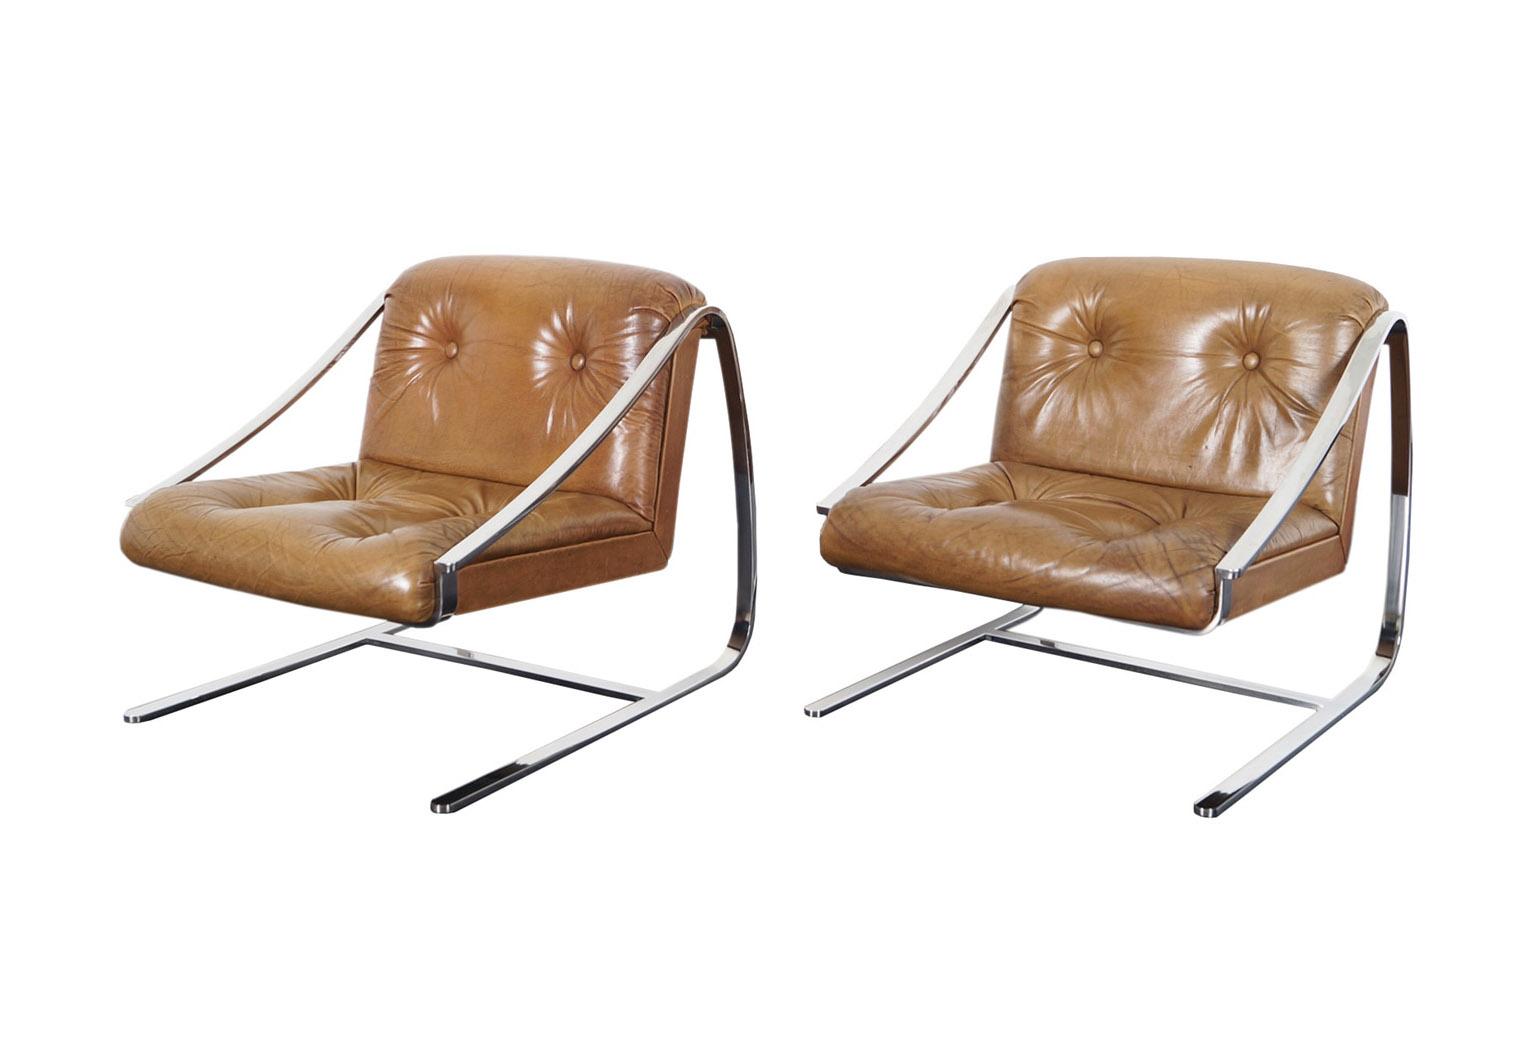 Vintage Plaza Lounge Chairs by Brueton